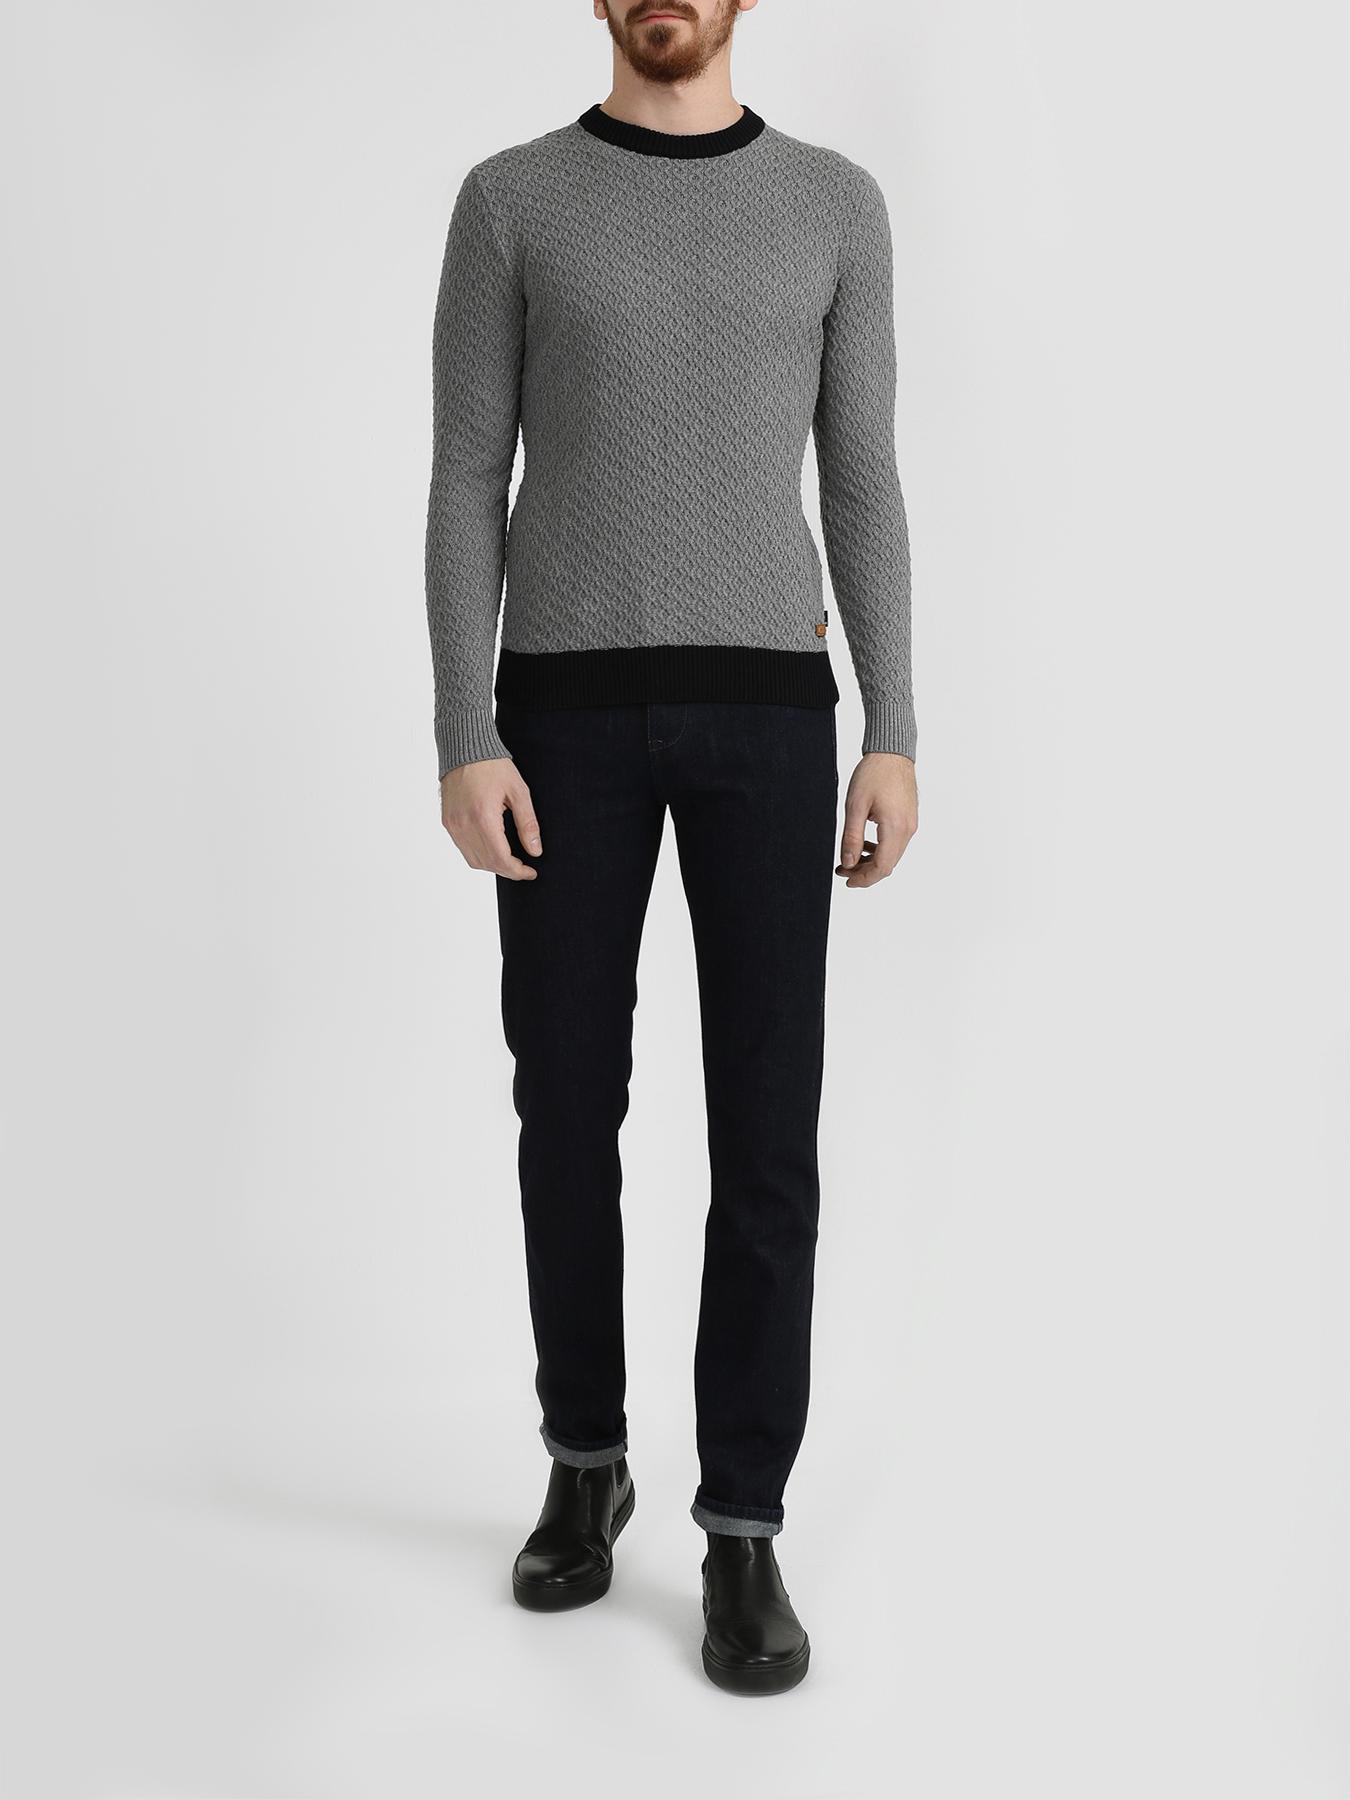 Alessandro Manzoni Jeans Хлопковый джемпер фото